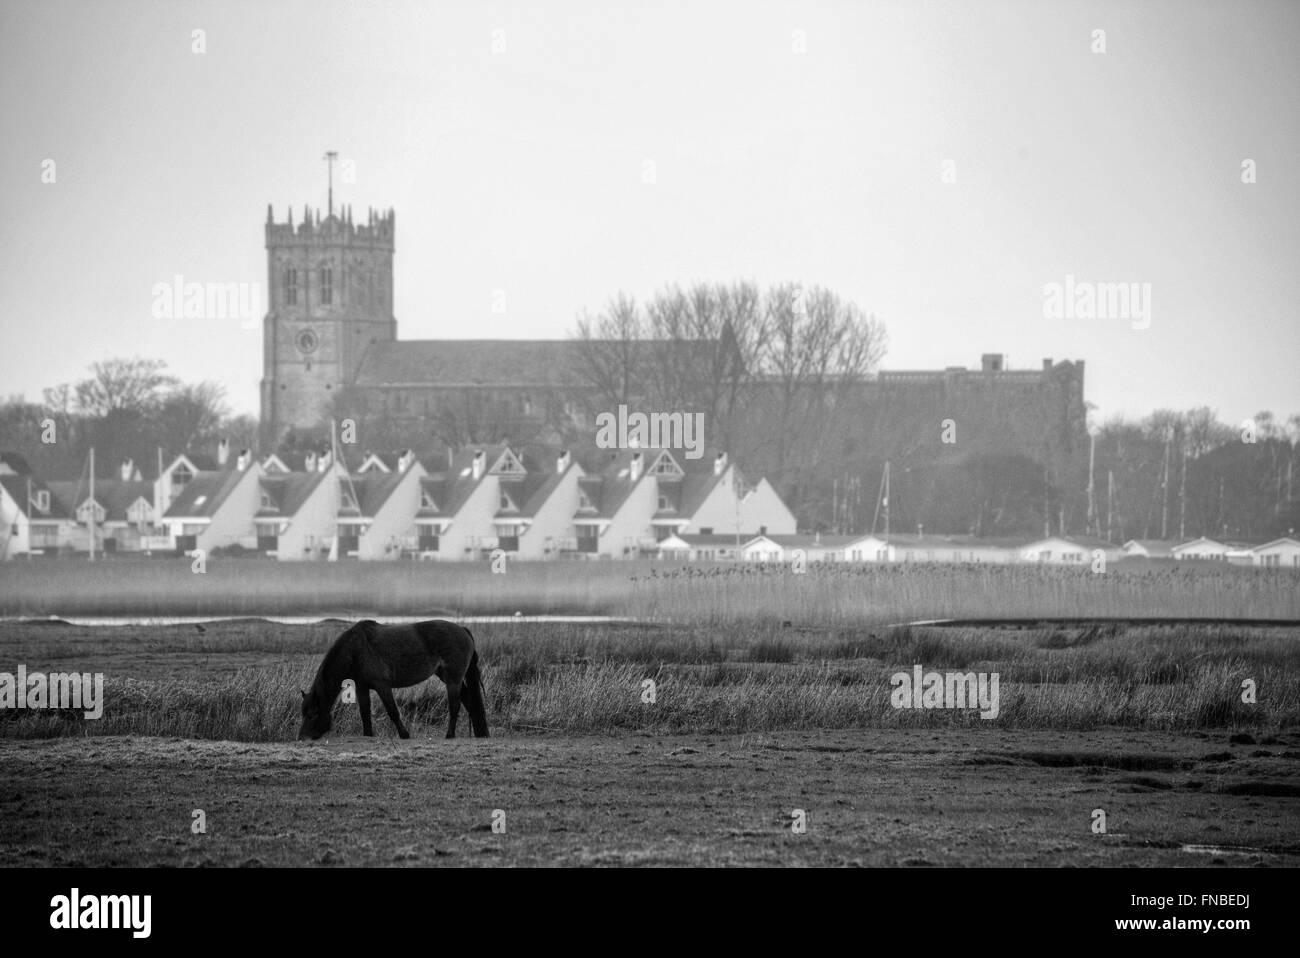 Christchurch Priory, Dorset, England, UK - Stock Image